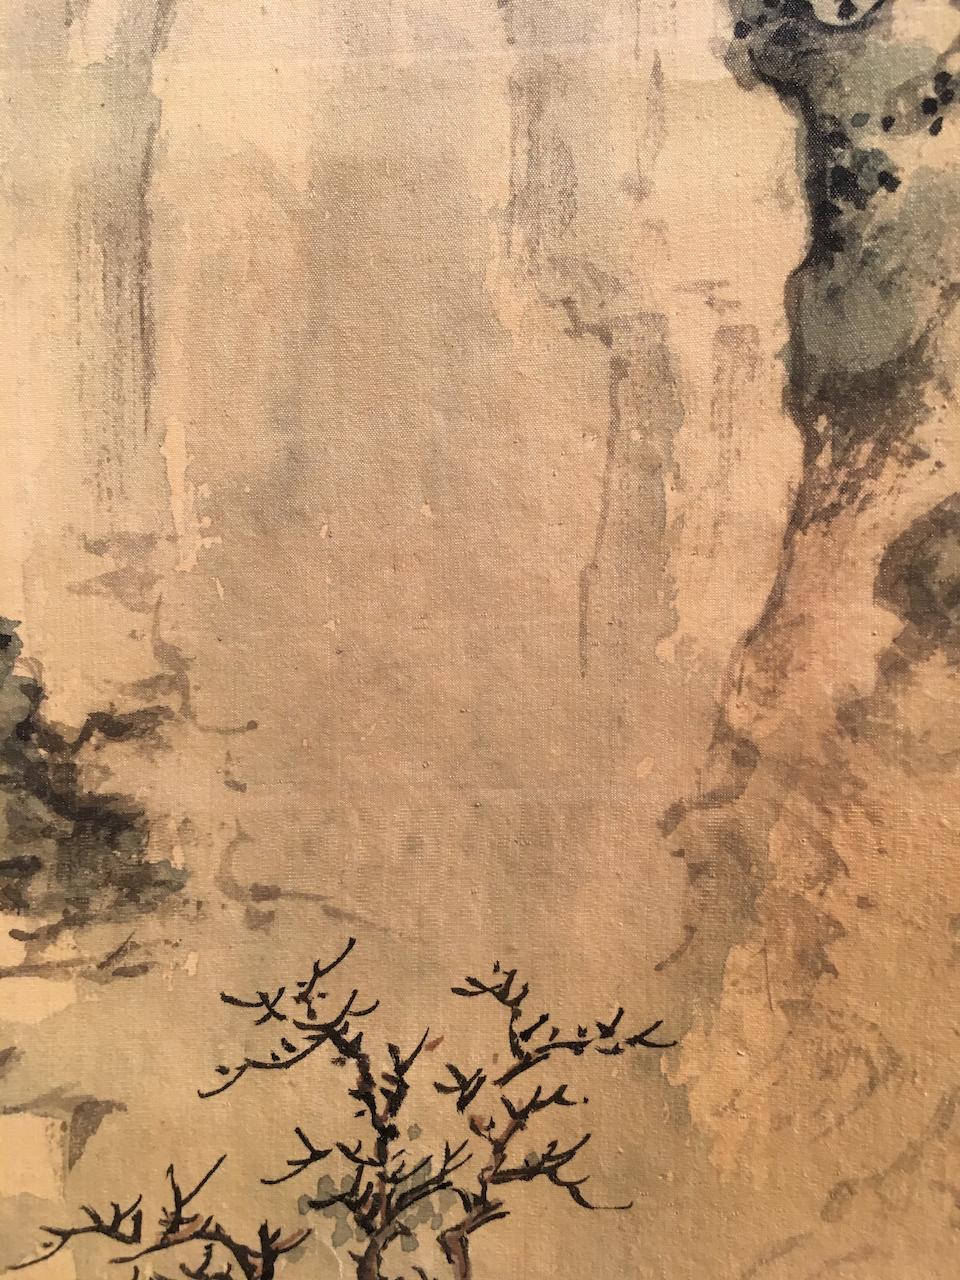 Zhang Zan (Qing dynasty) Snow Landscape